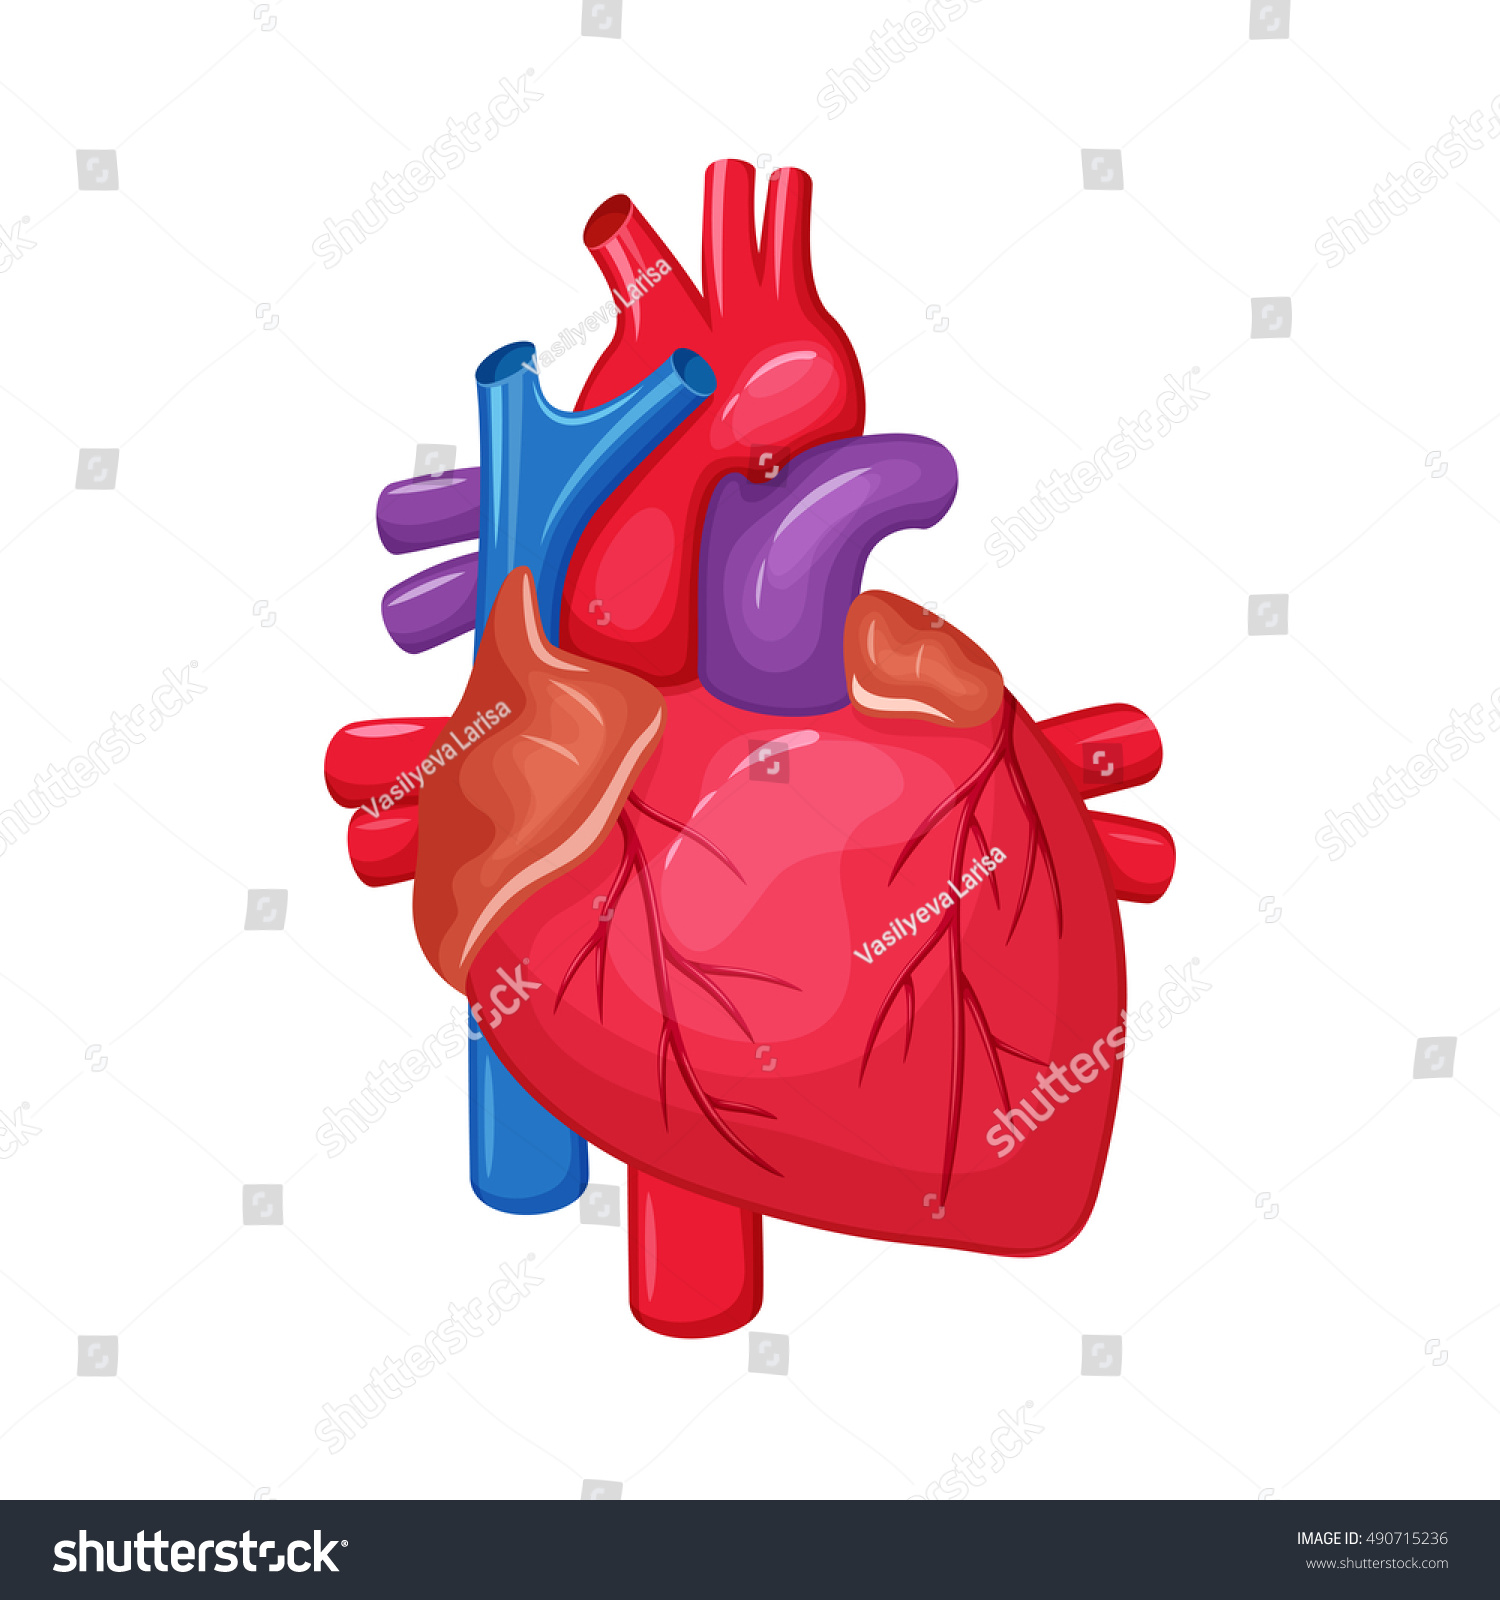 Human Heart Anatomy Medical Science Illustration Stock Illustration